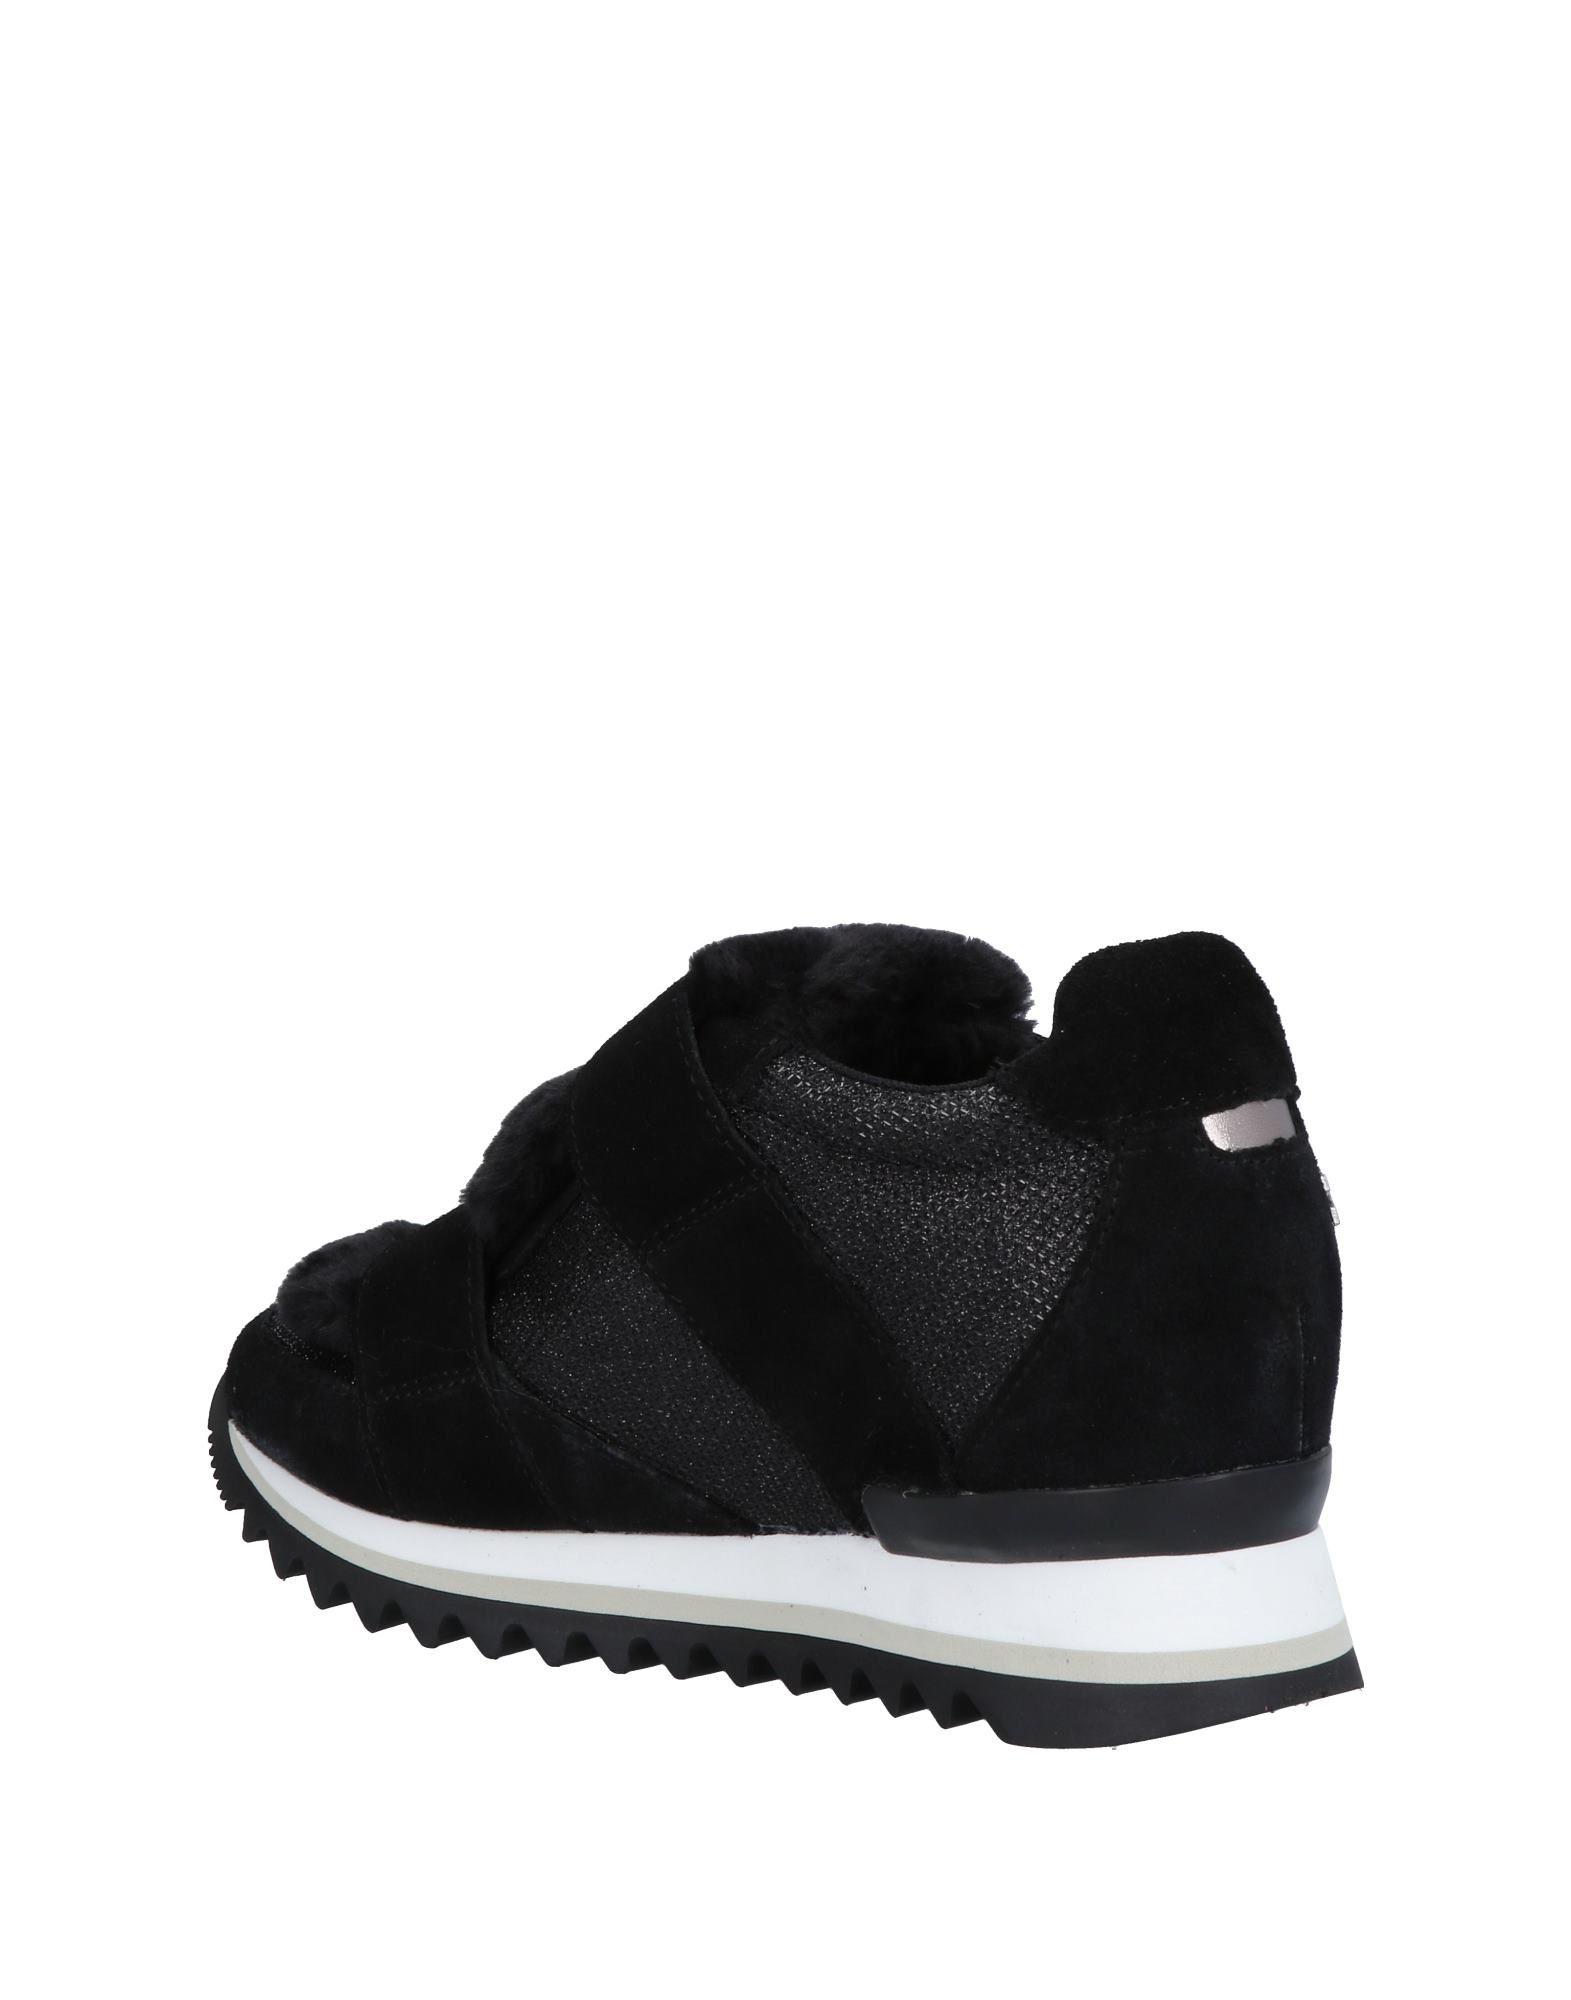 Gioseppo Sneakers Damen  11461774LX Gute Qualität beliebte Schuhe